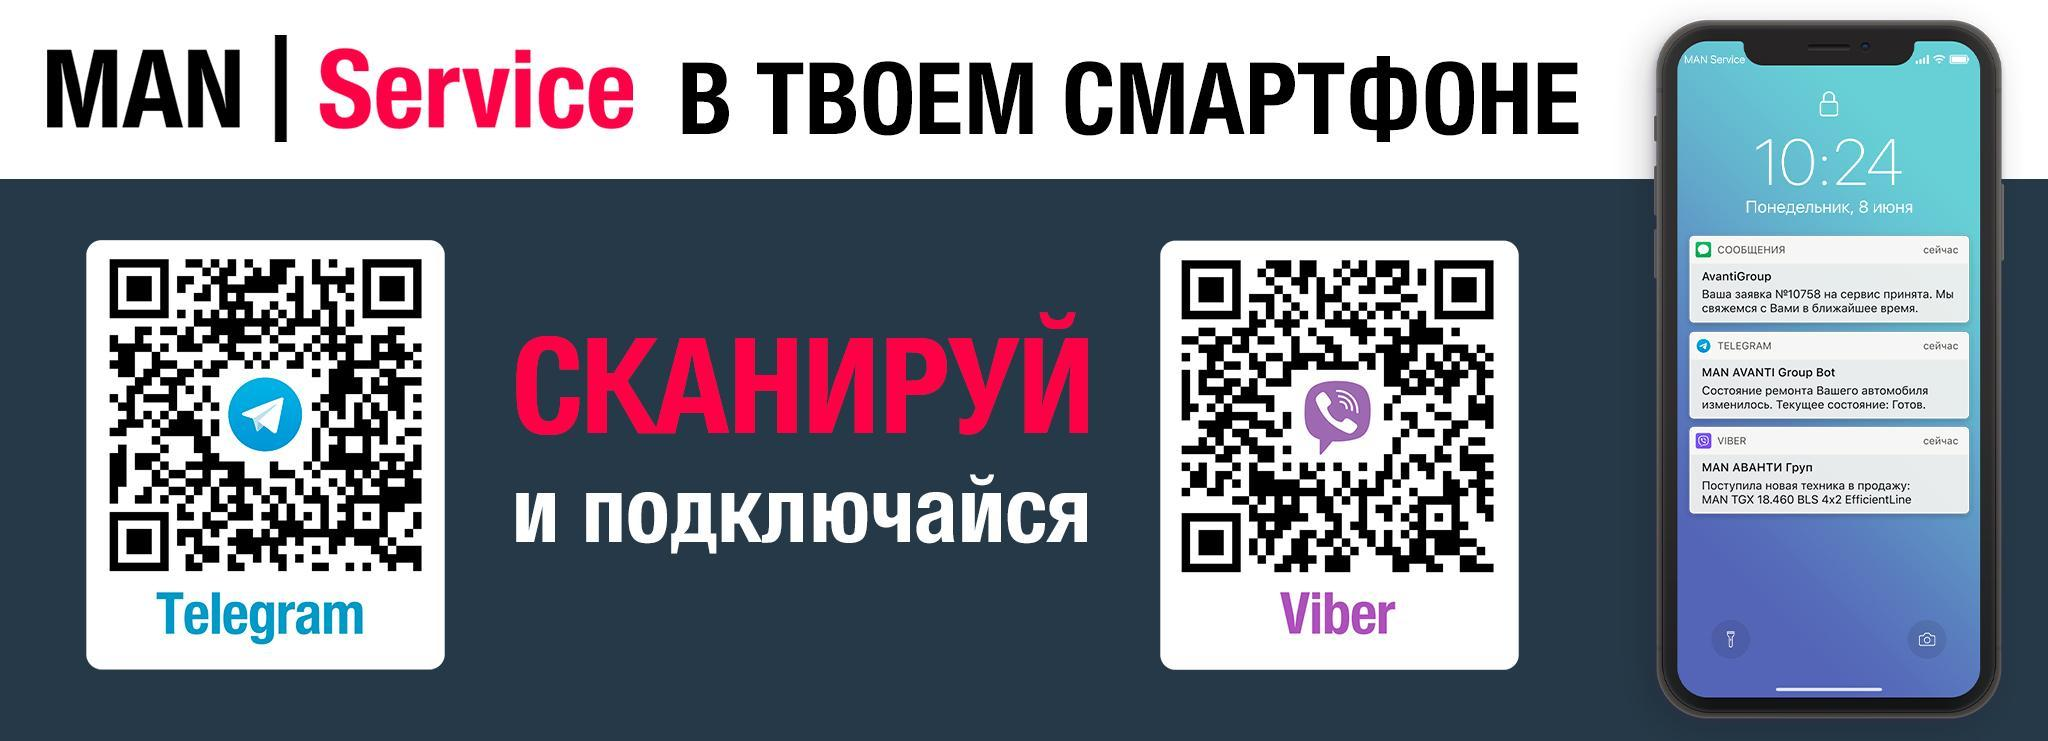 MAN Service в Telegram и Viber